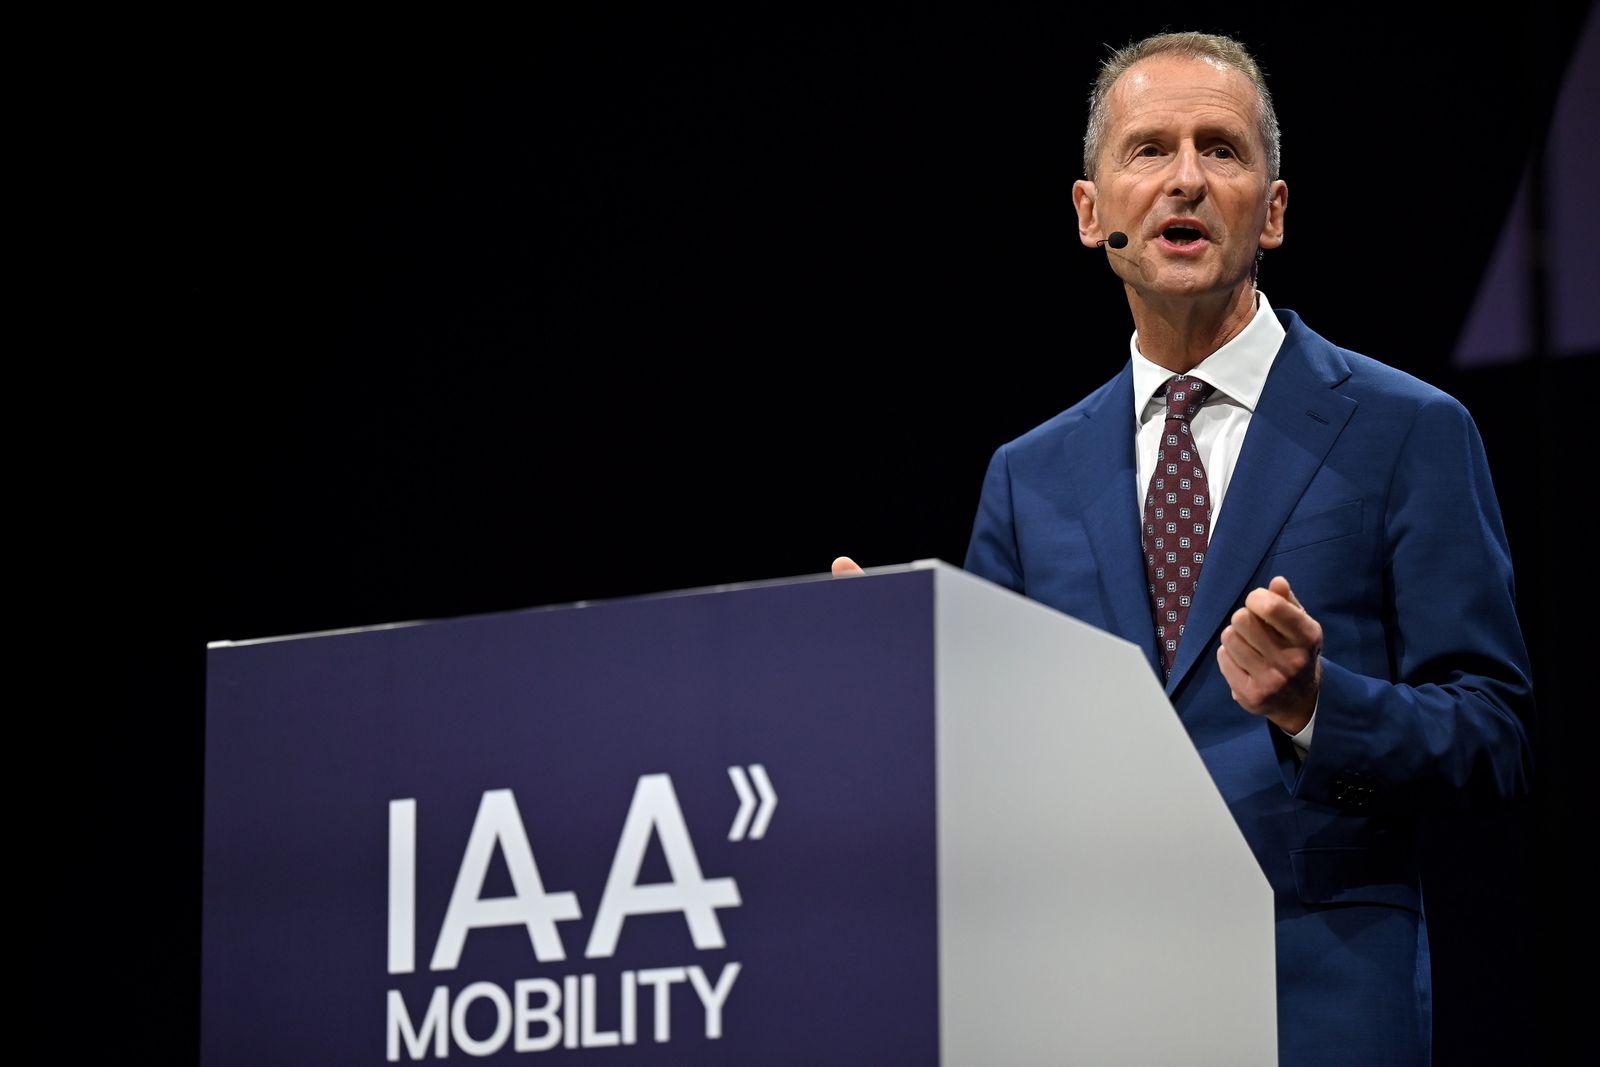 IAA Mobility 2021 International Motor Show